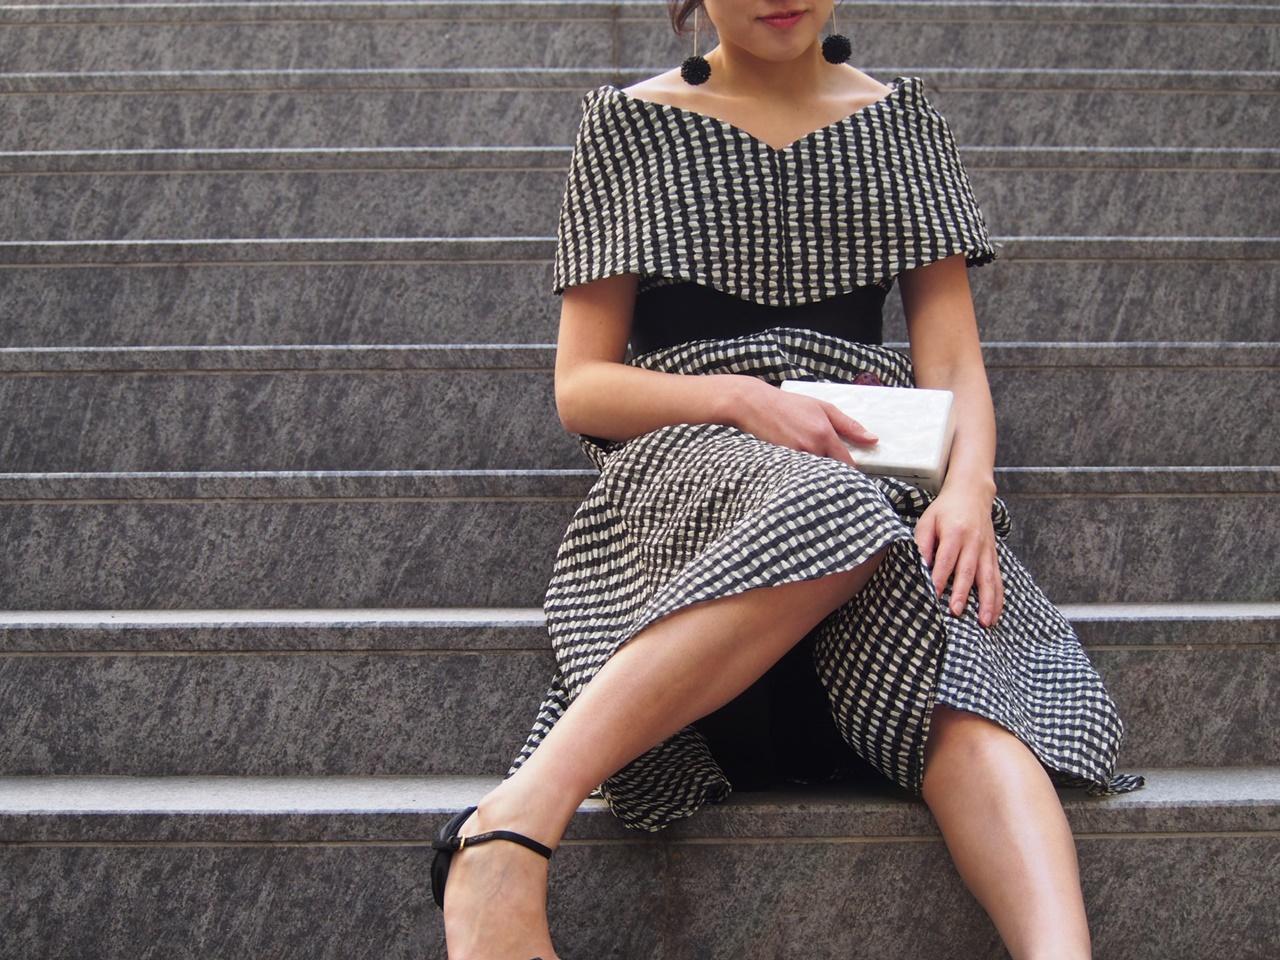 Lelarose(レラ・ローズ)の黒のギンガムチェックのオフショルダードレス